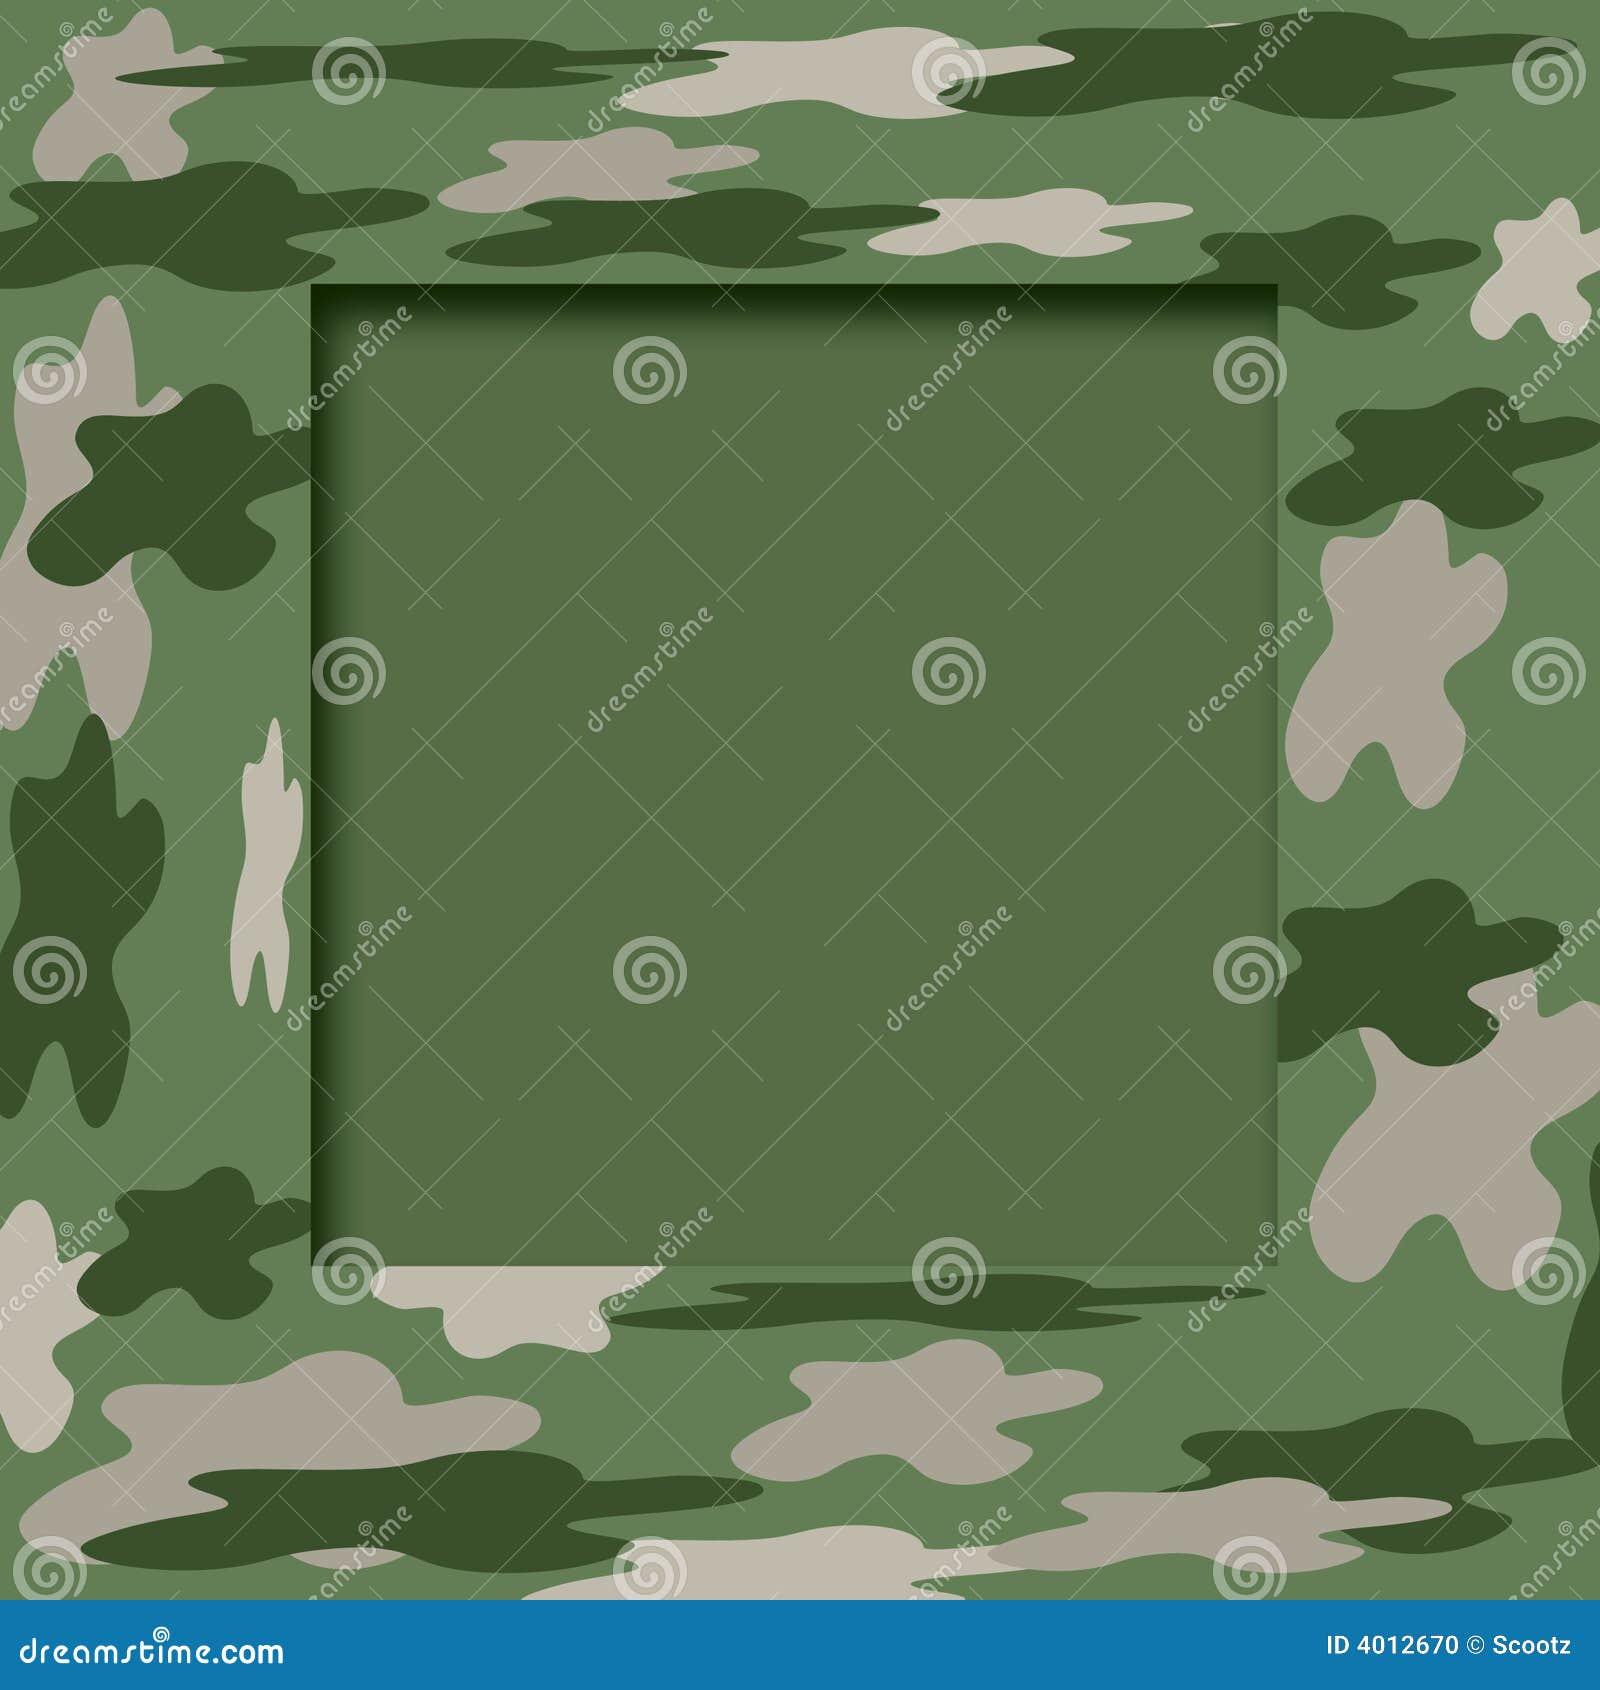 Camouflage frame stock illustration. Illustration of military - 4012670